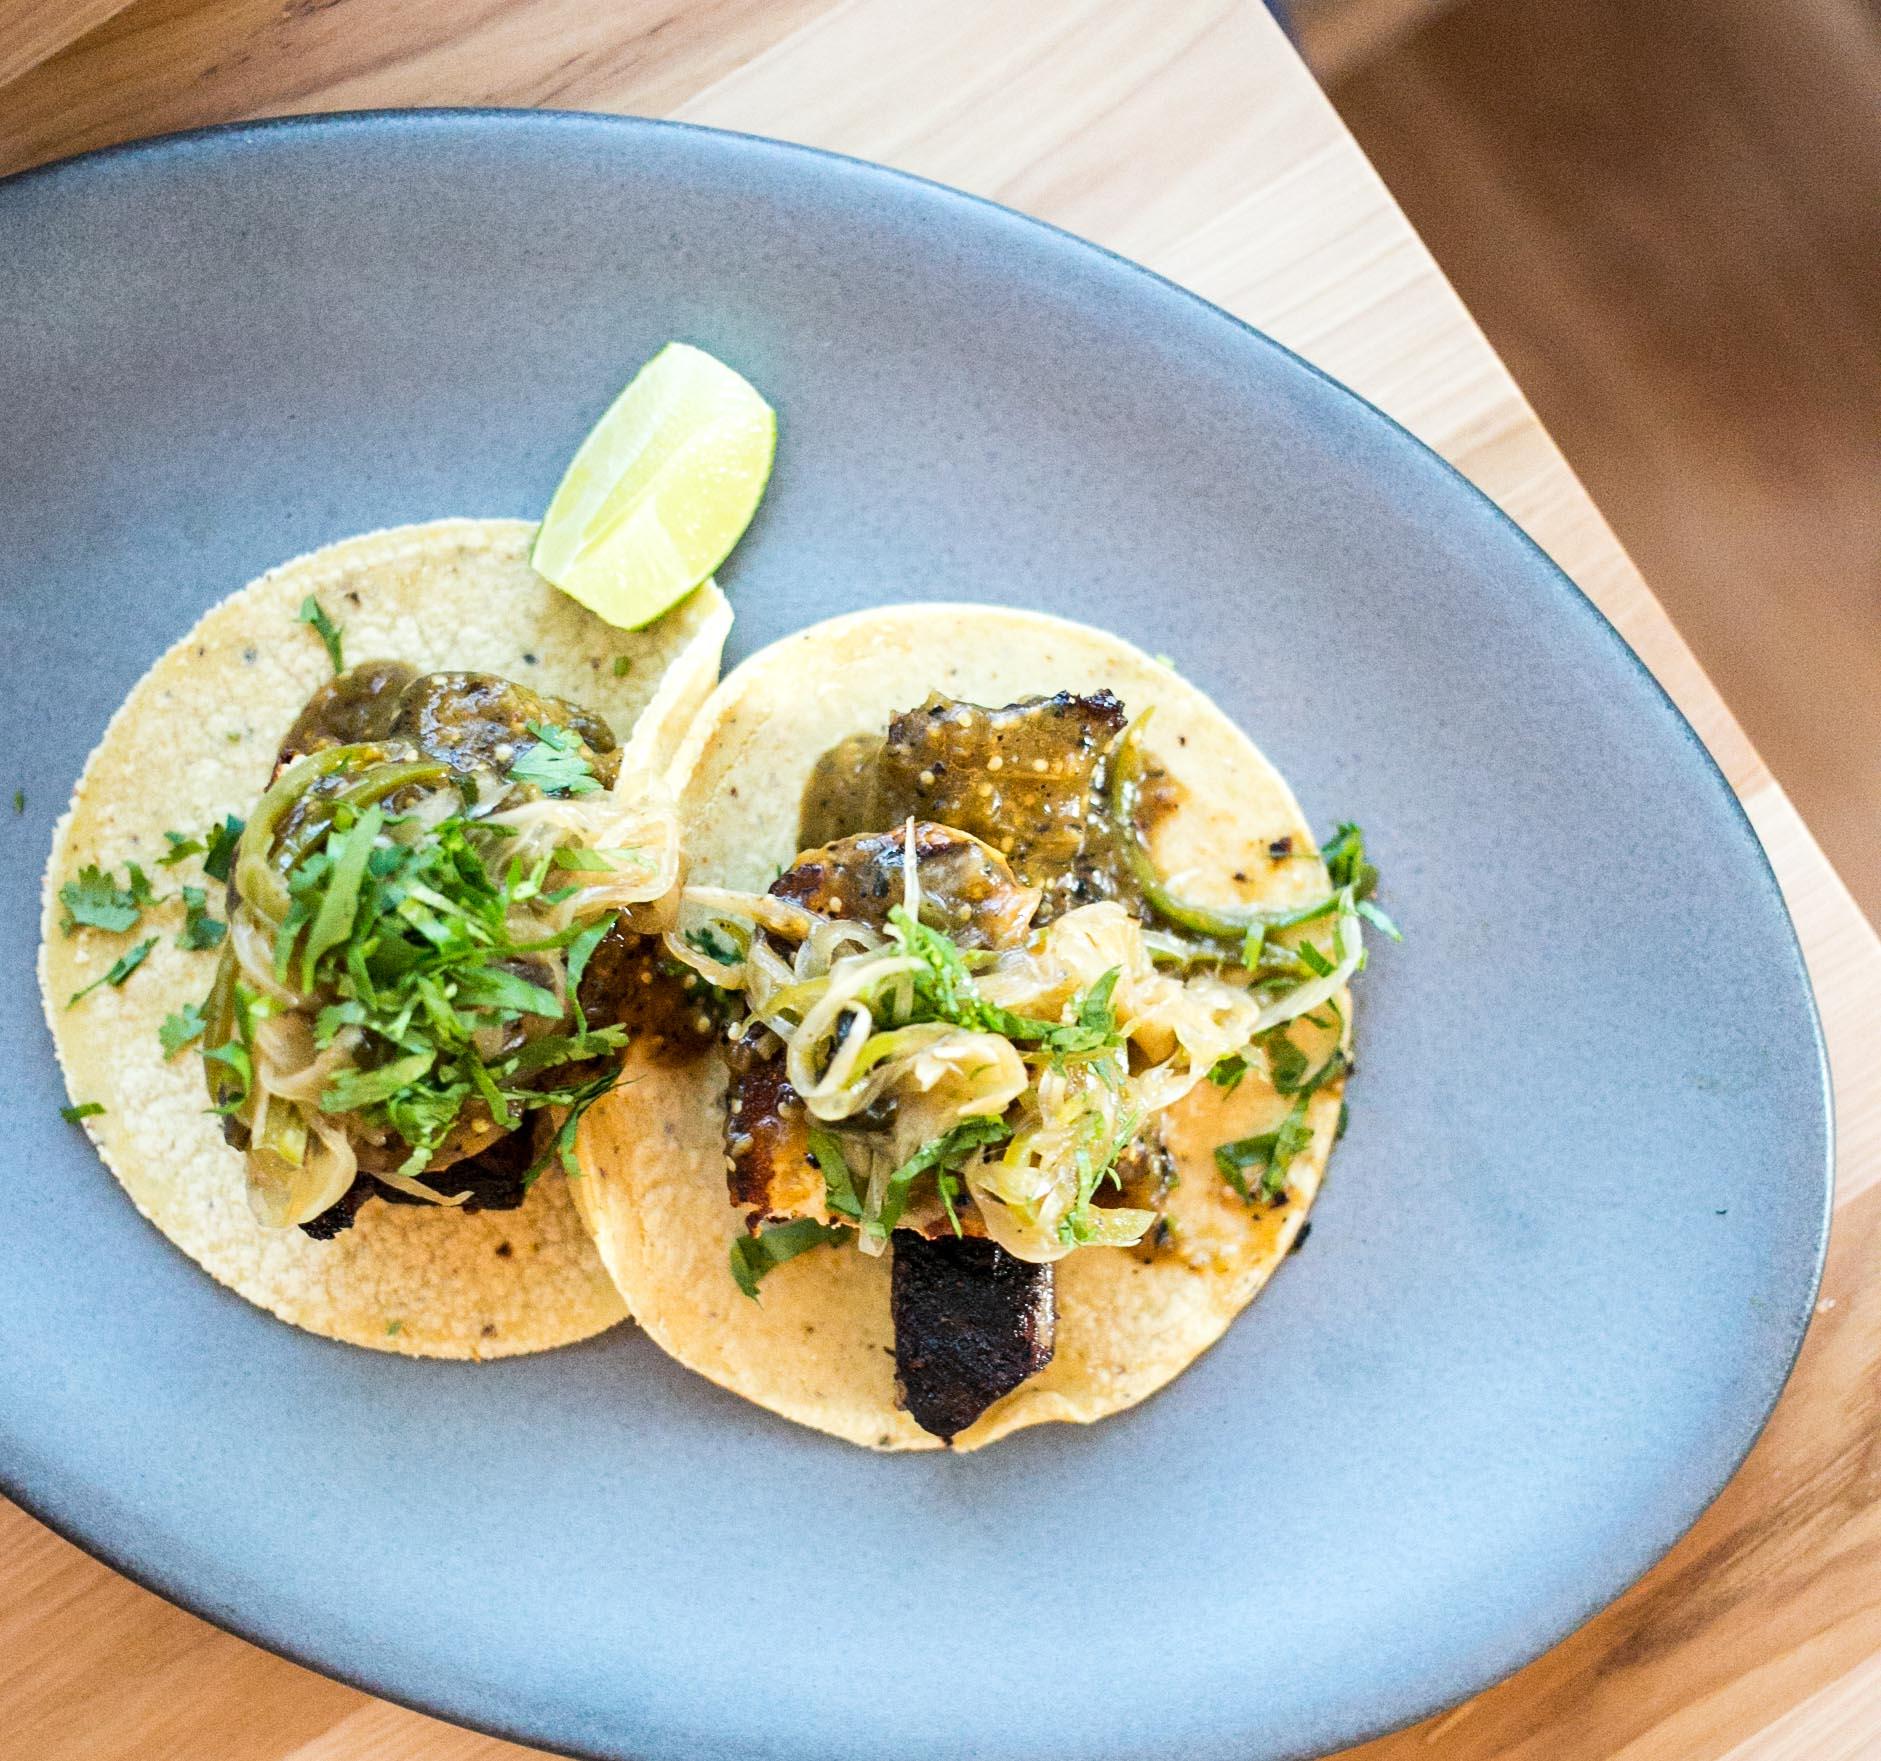 Tacos from ATX Cocina